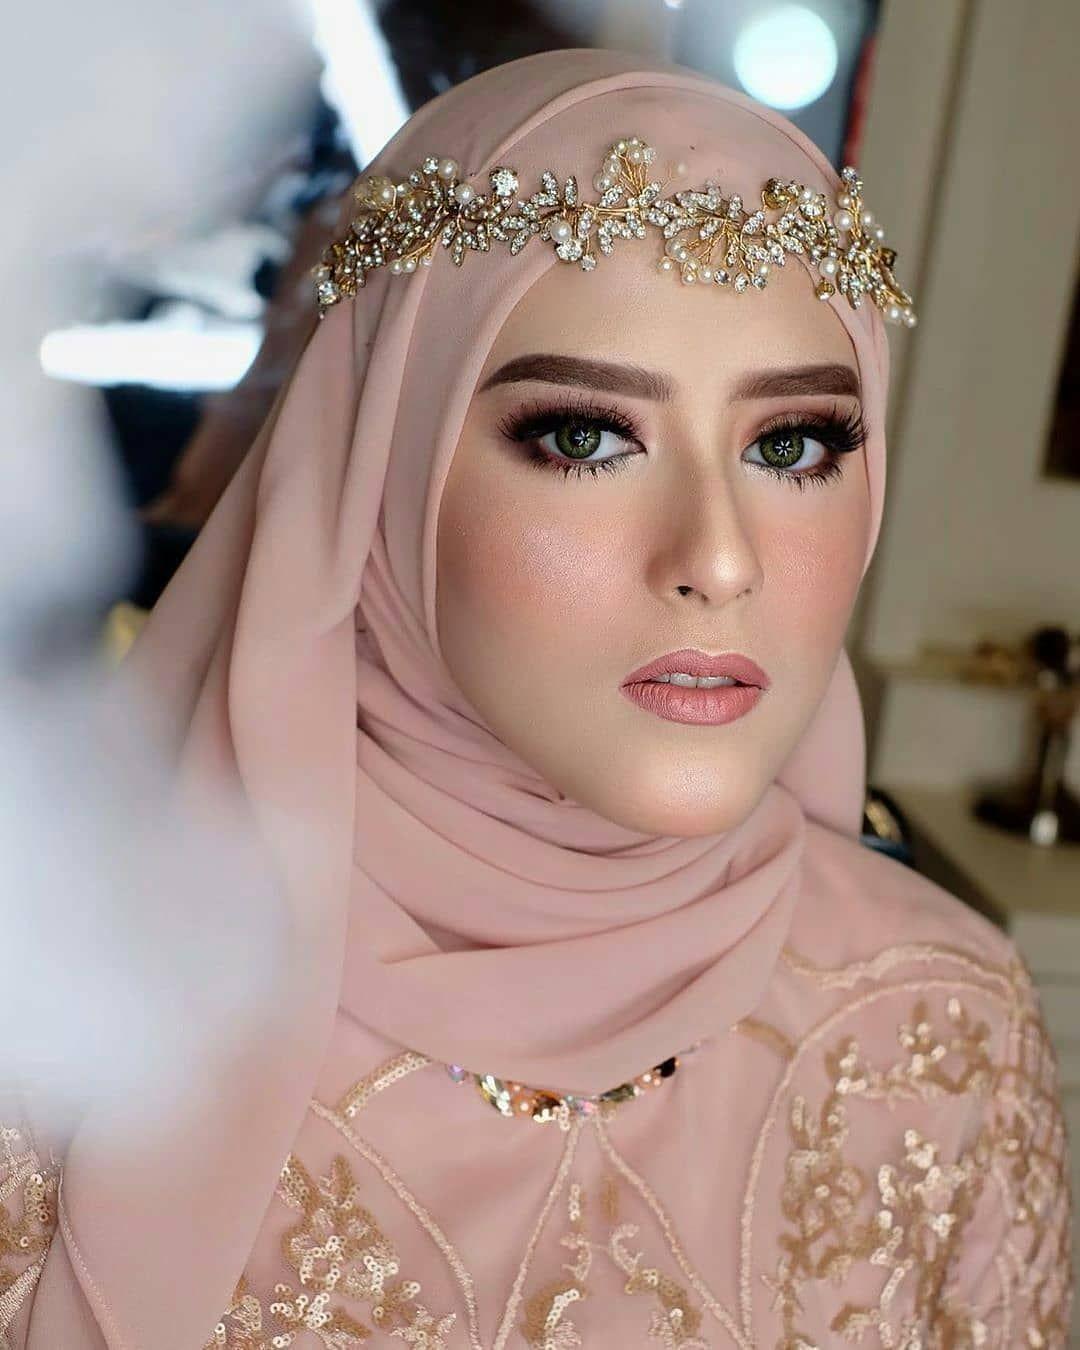 Gorgeous Makeup By Inayahamudy Pengantin Wanita Pernikahan